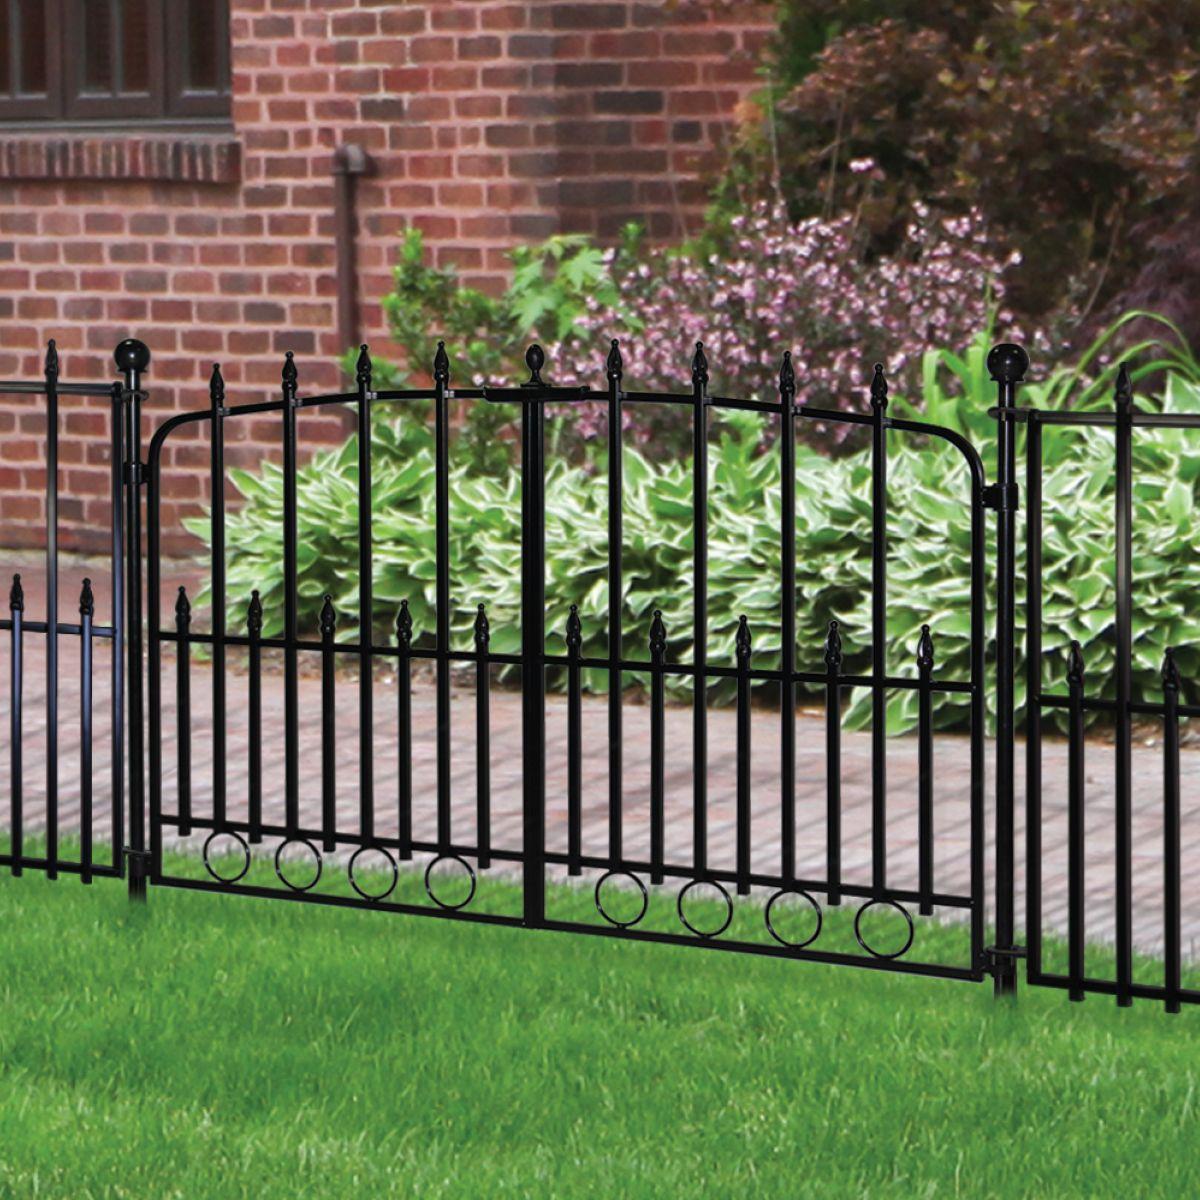 Empire Fences Residential Fencing Aluminum Fence Systems Garden Fencing Outdoor Decor